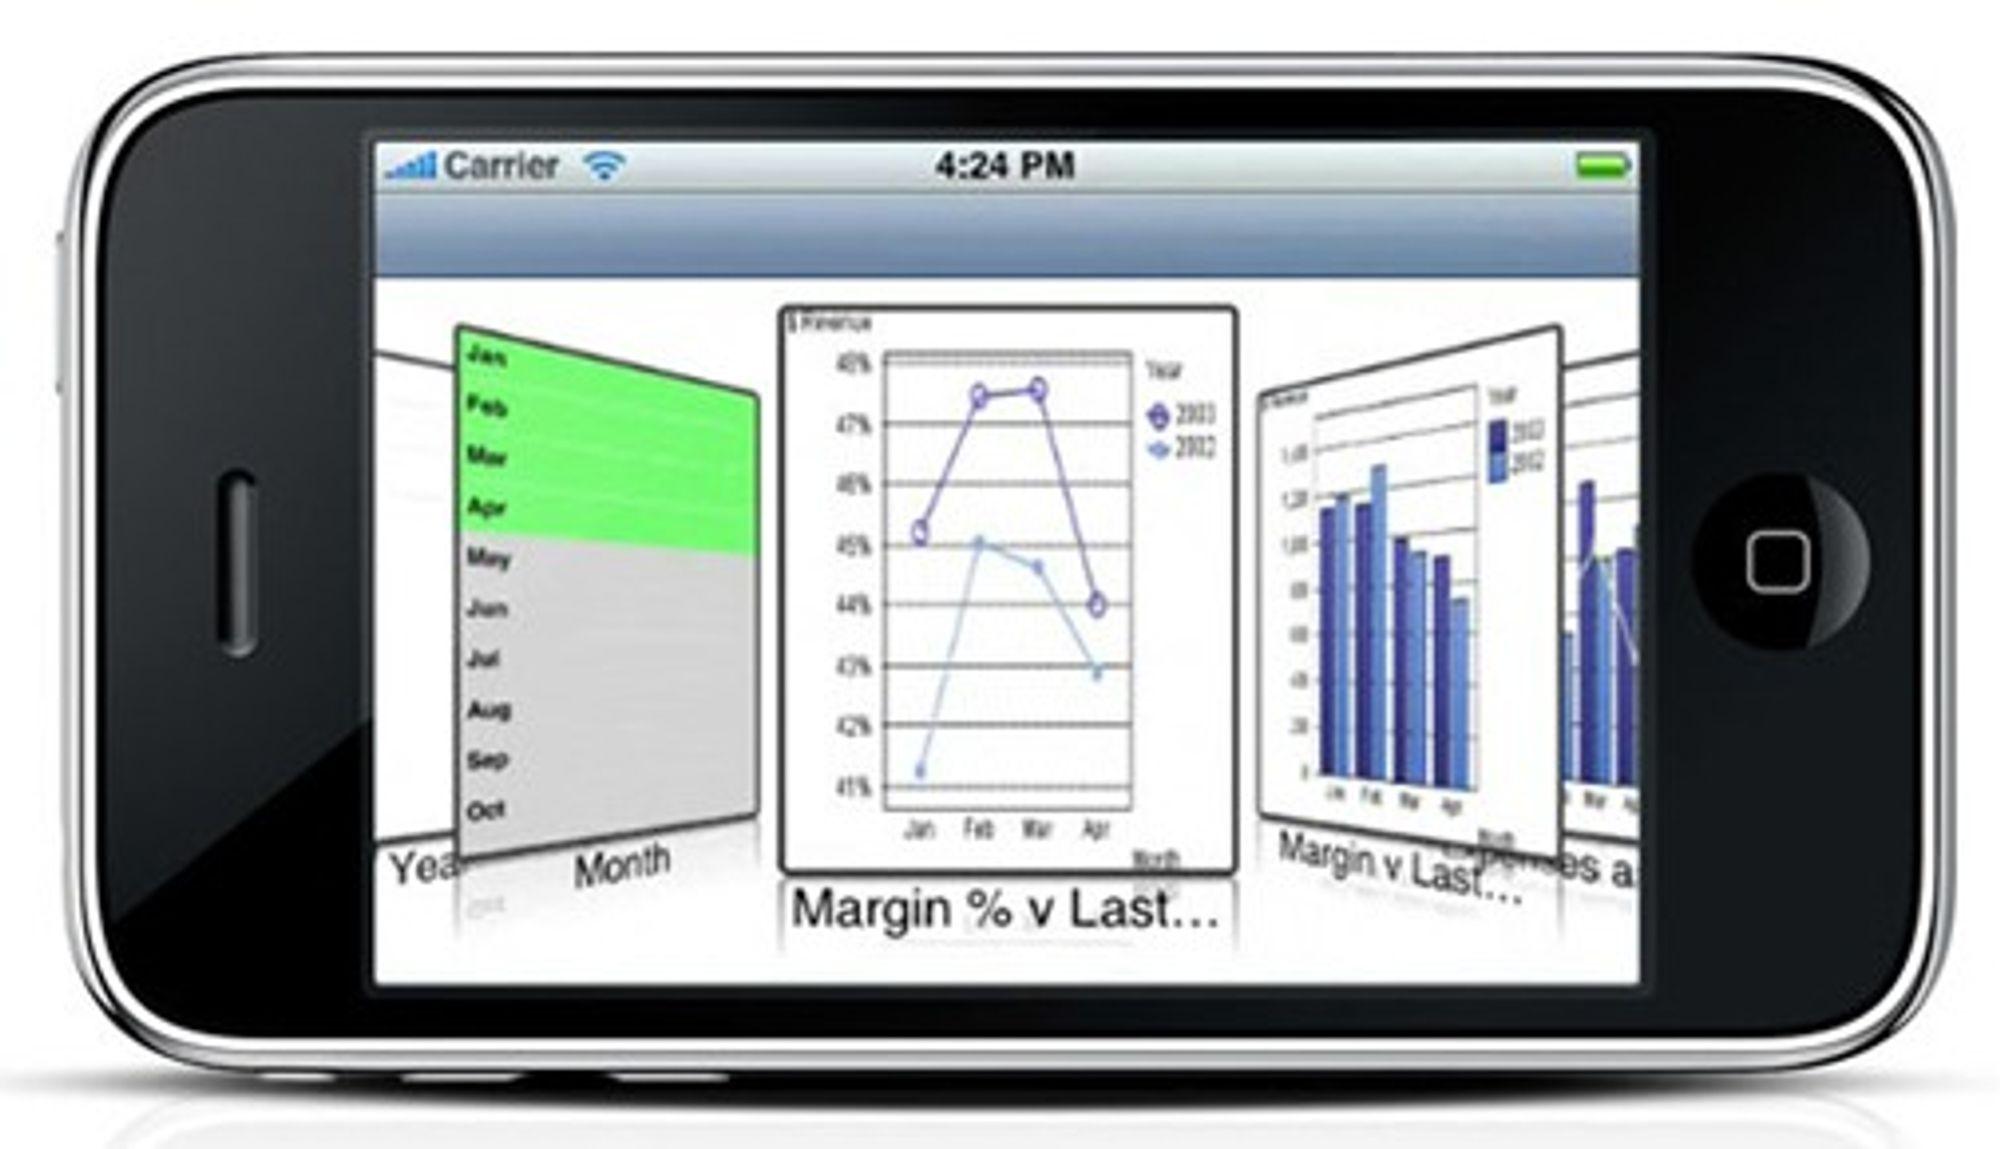 Med QlikView er også iPhone er et hjelpemiddel til analyse og beslutninger.